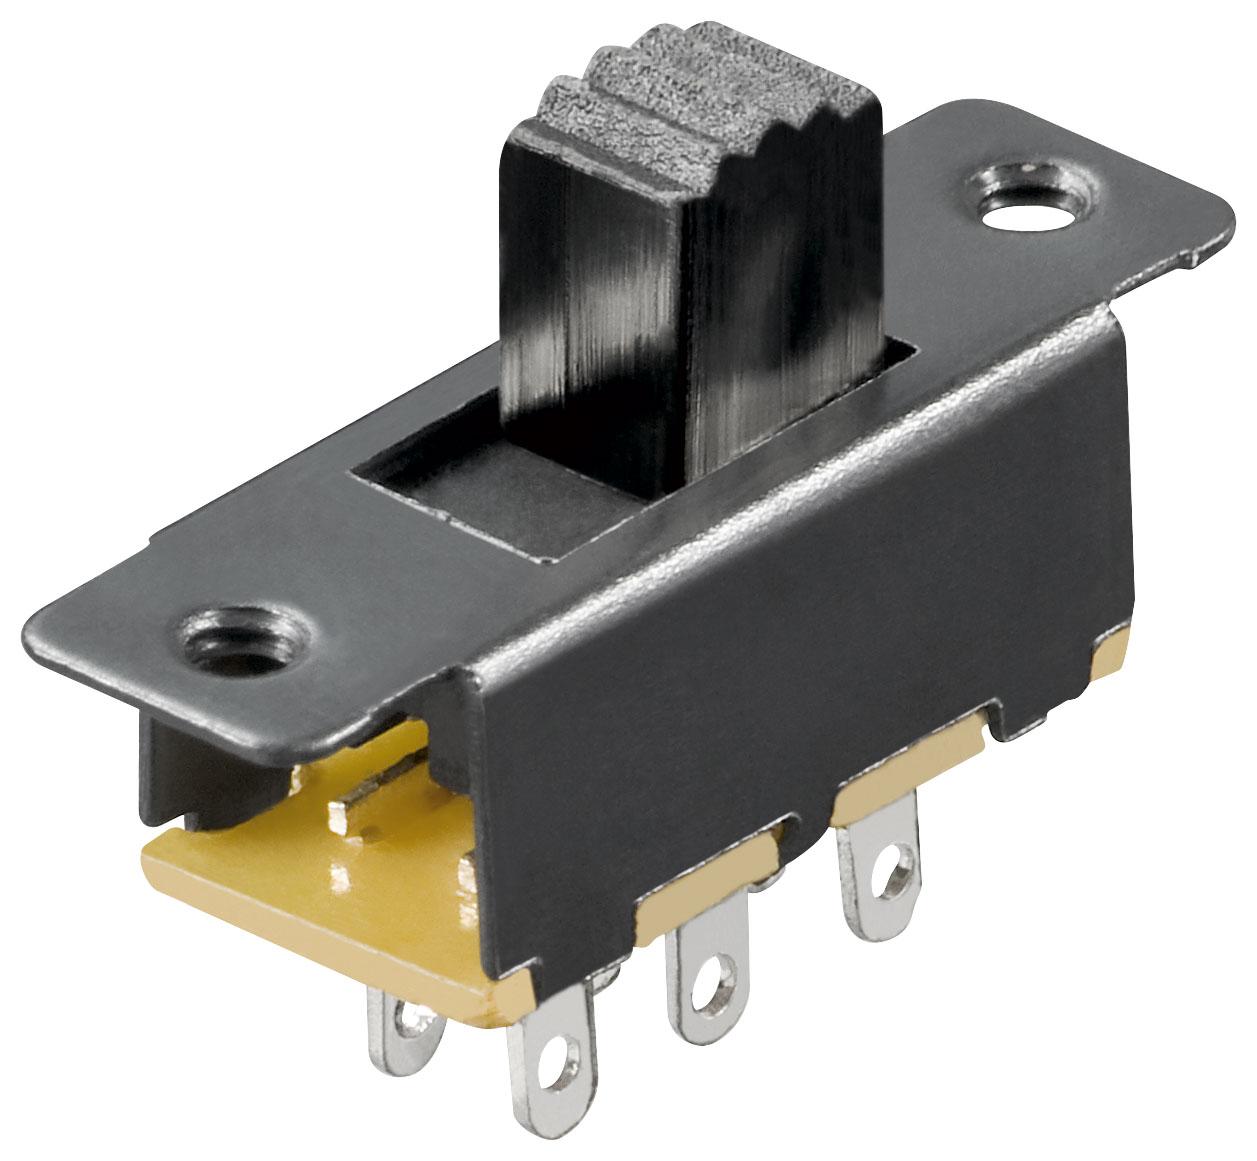 50x-Schiebeschalter-6-Pins-2xUM-Lochabstaende-19-mm